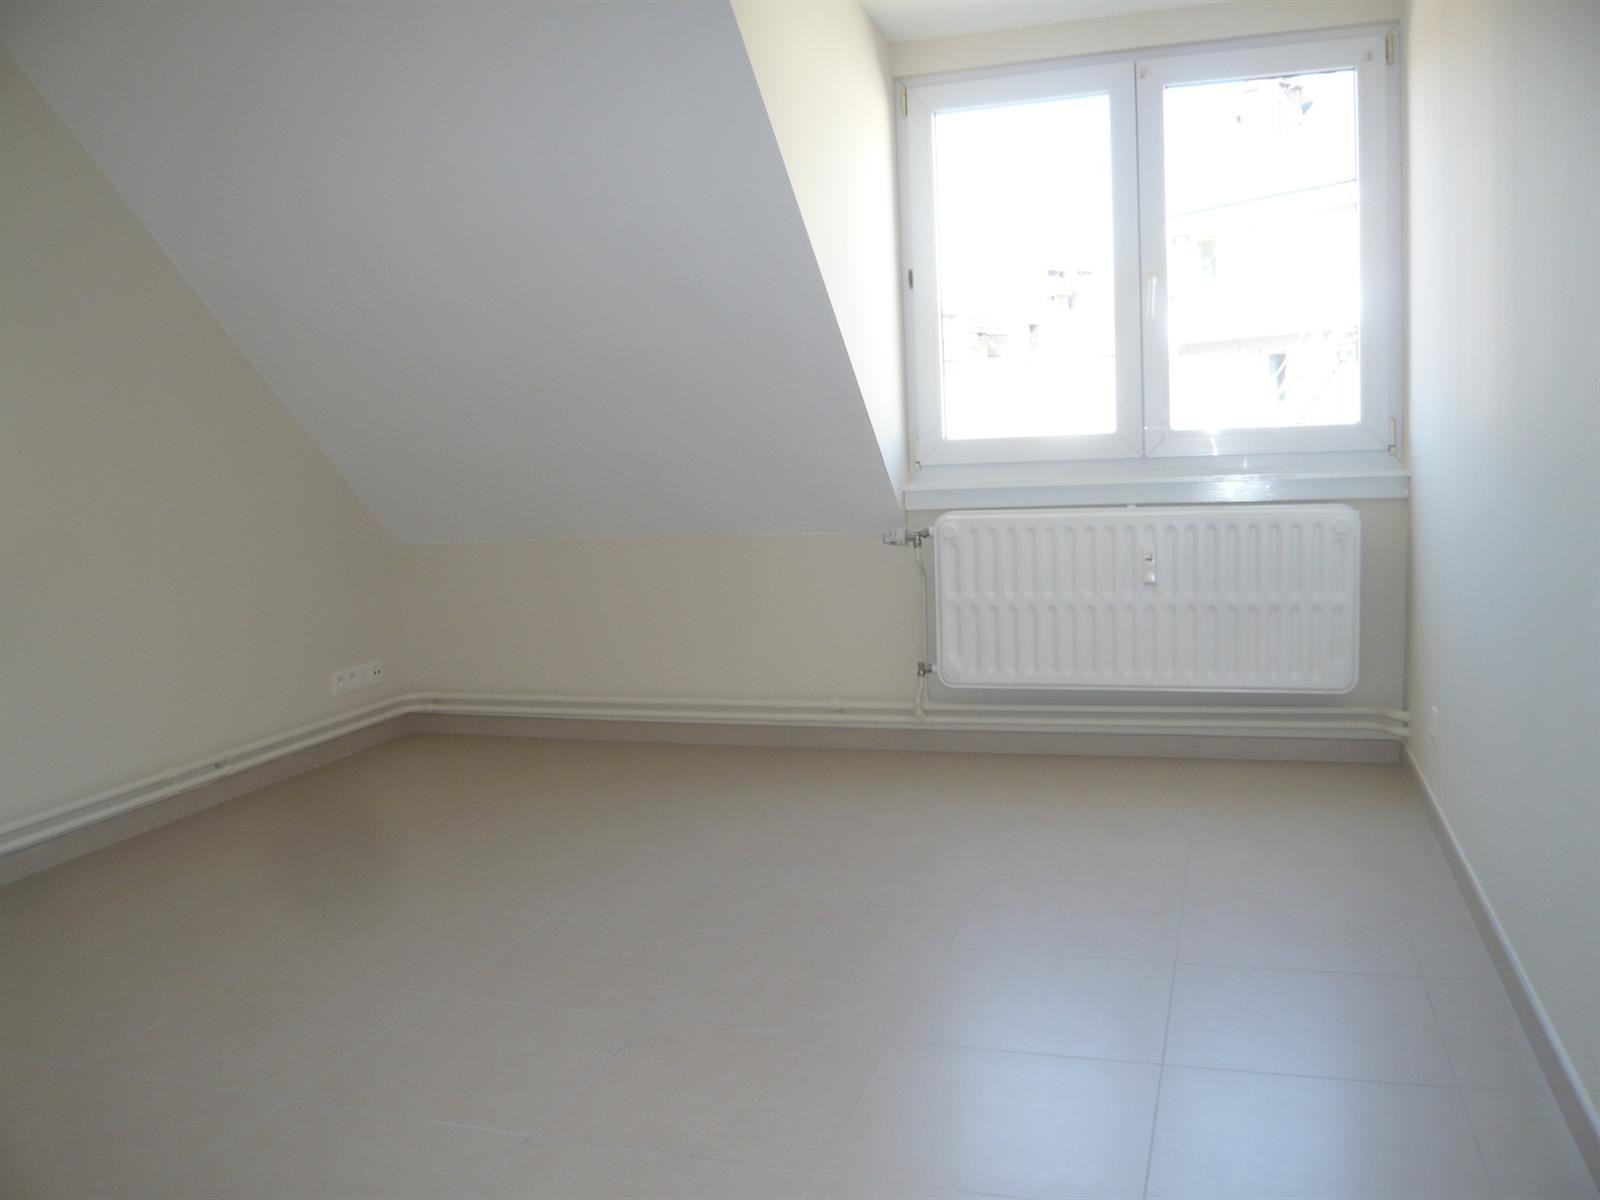 Appartement - Woluwe-Saint-Lambert - #4286376-15